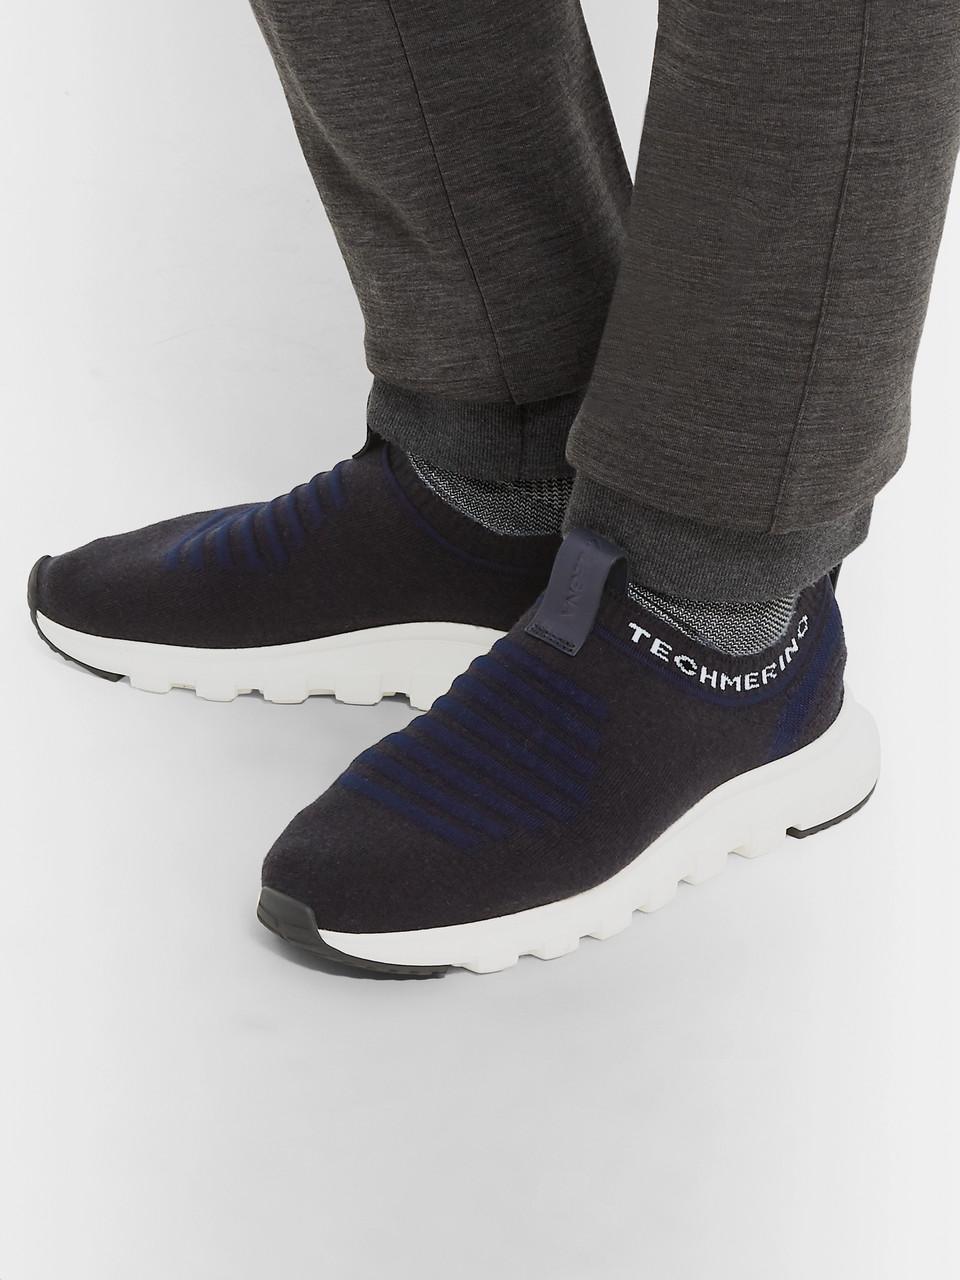 8143d90c99 Ermenegildo Zegna Leather-Trimmed TECHMERINO Wool-Mesh Slip-On Sneakers